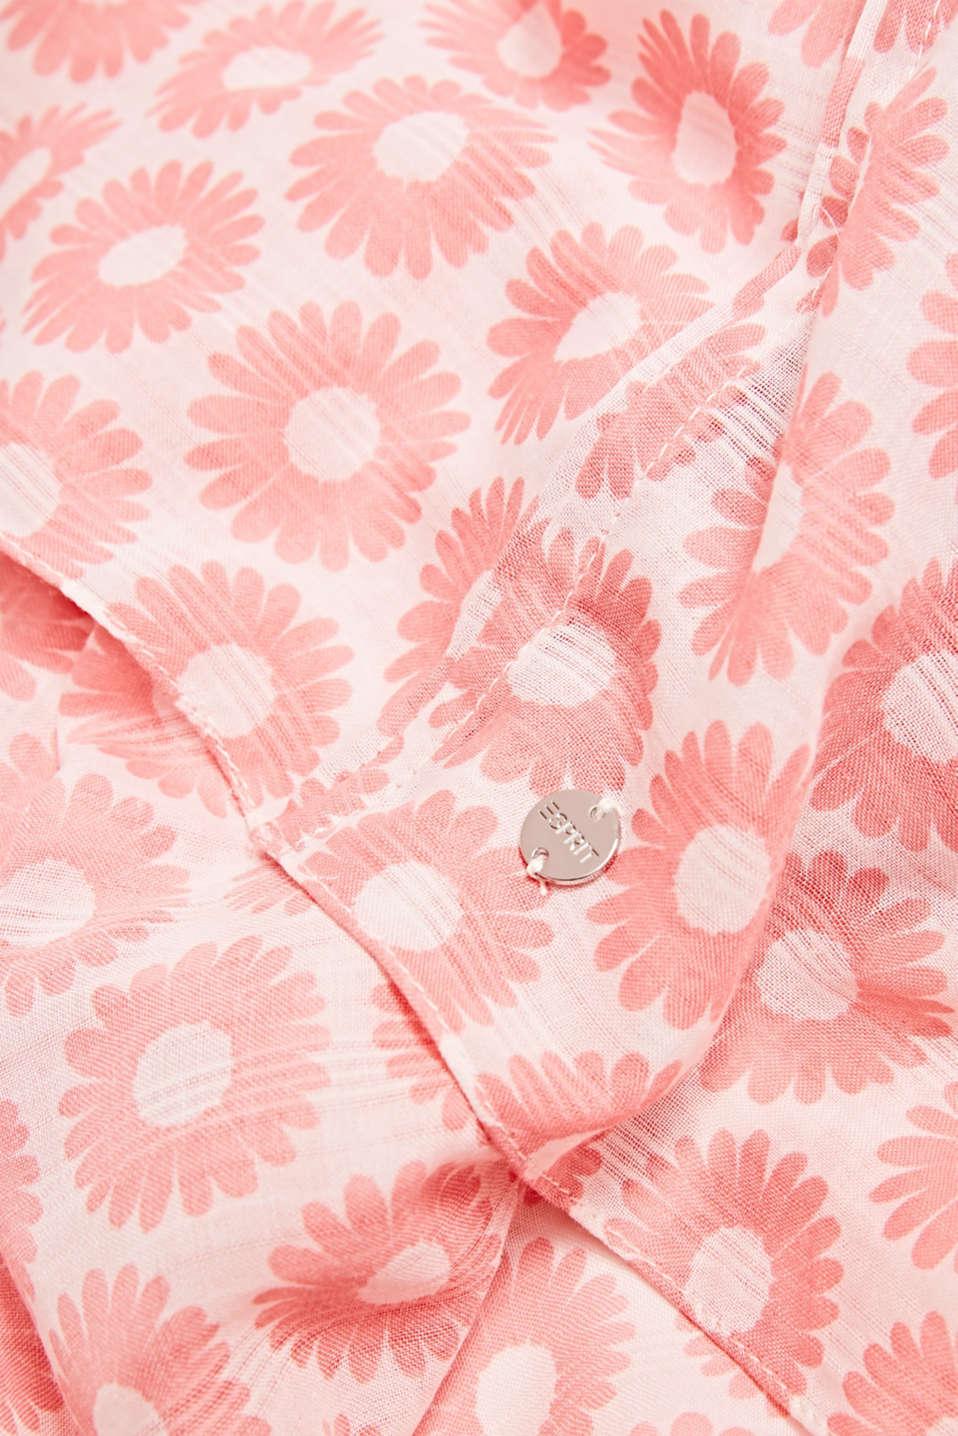 Snood with floral print, LIGHT PINK, detail image number 2